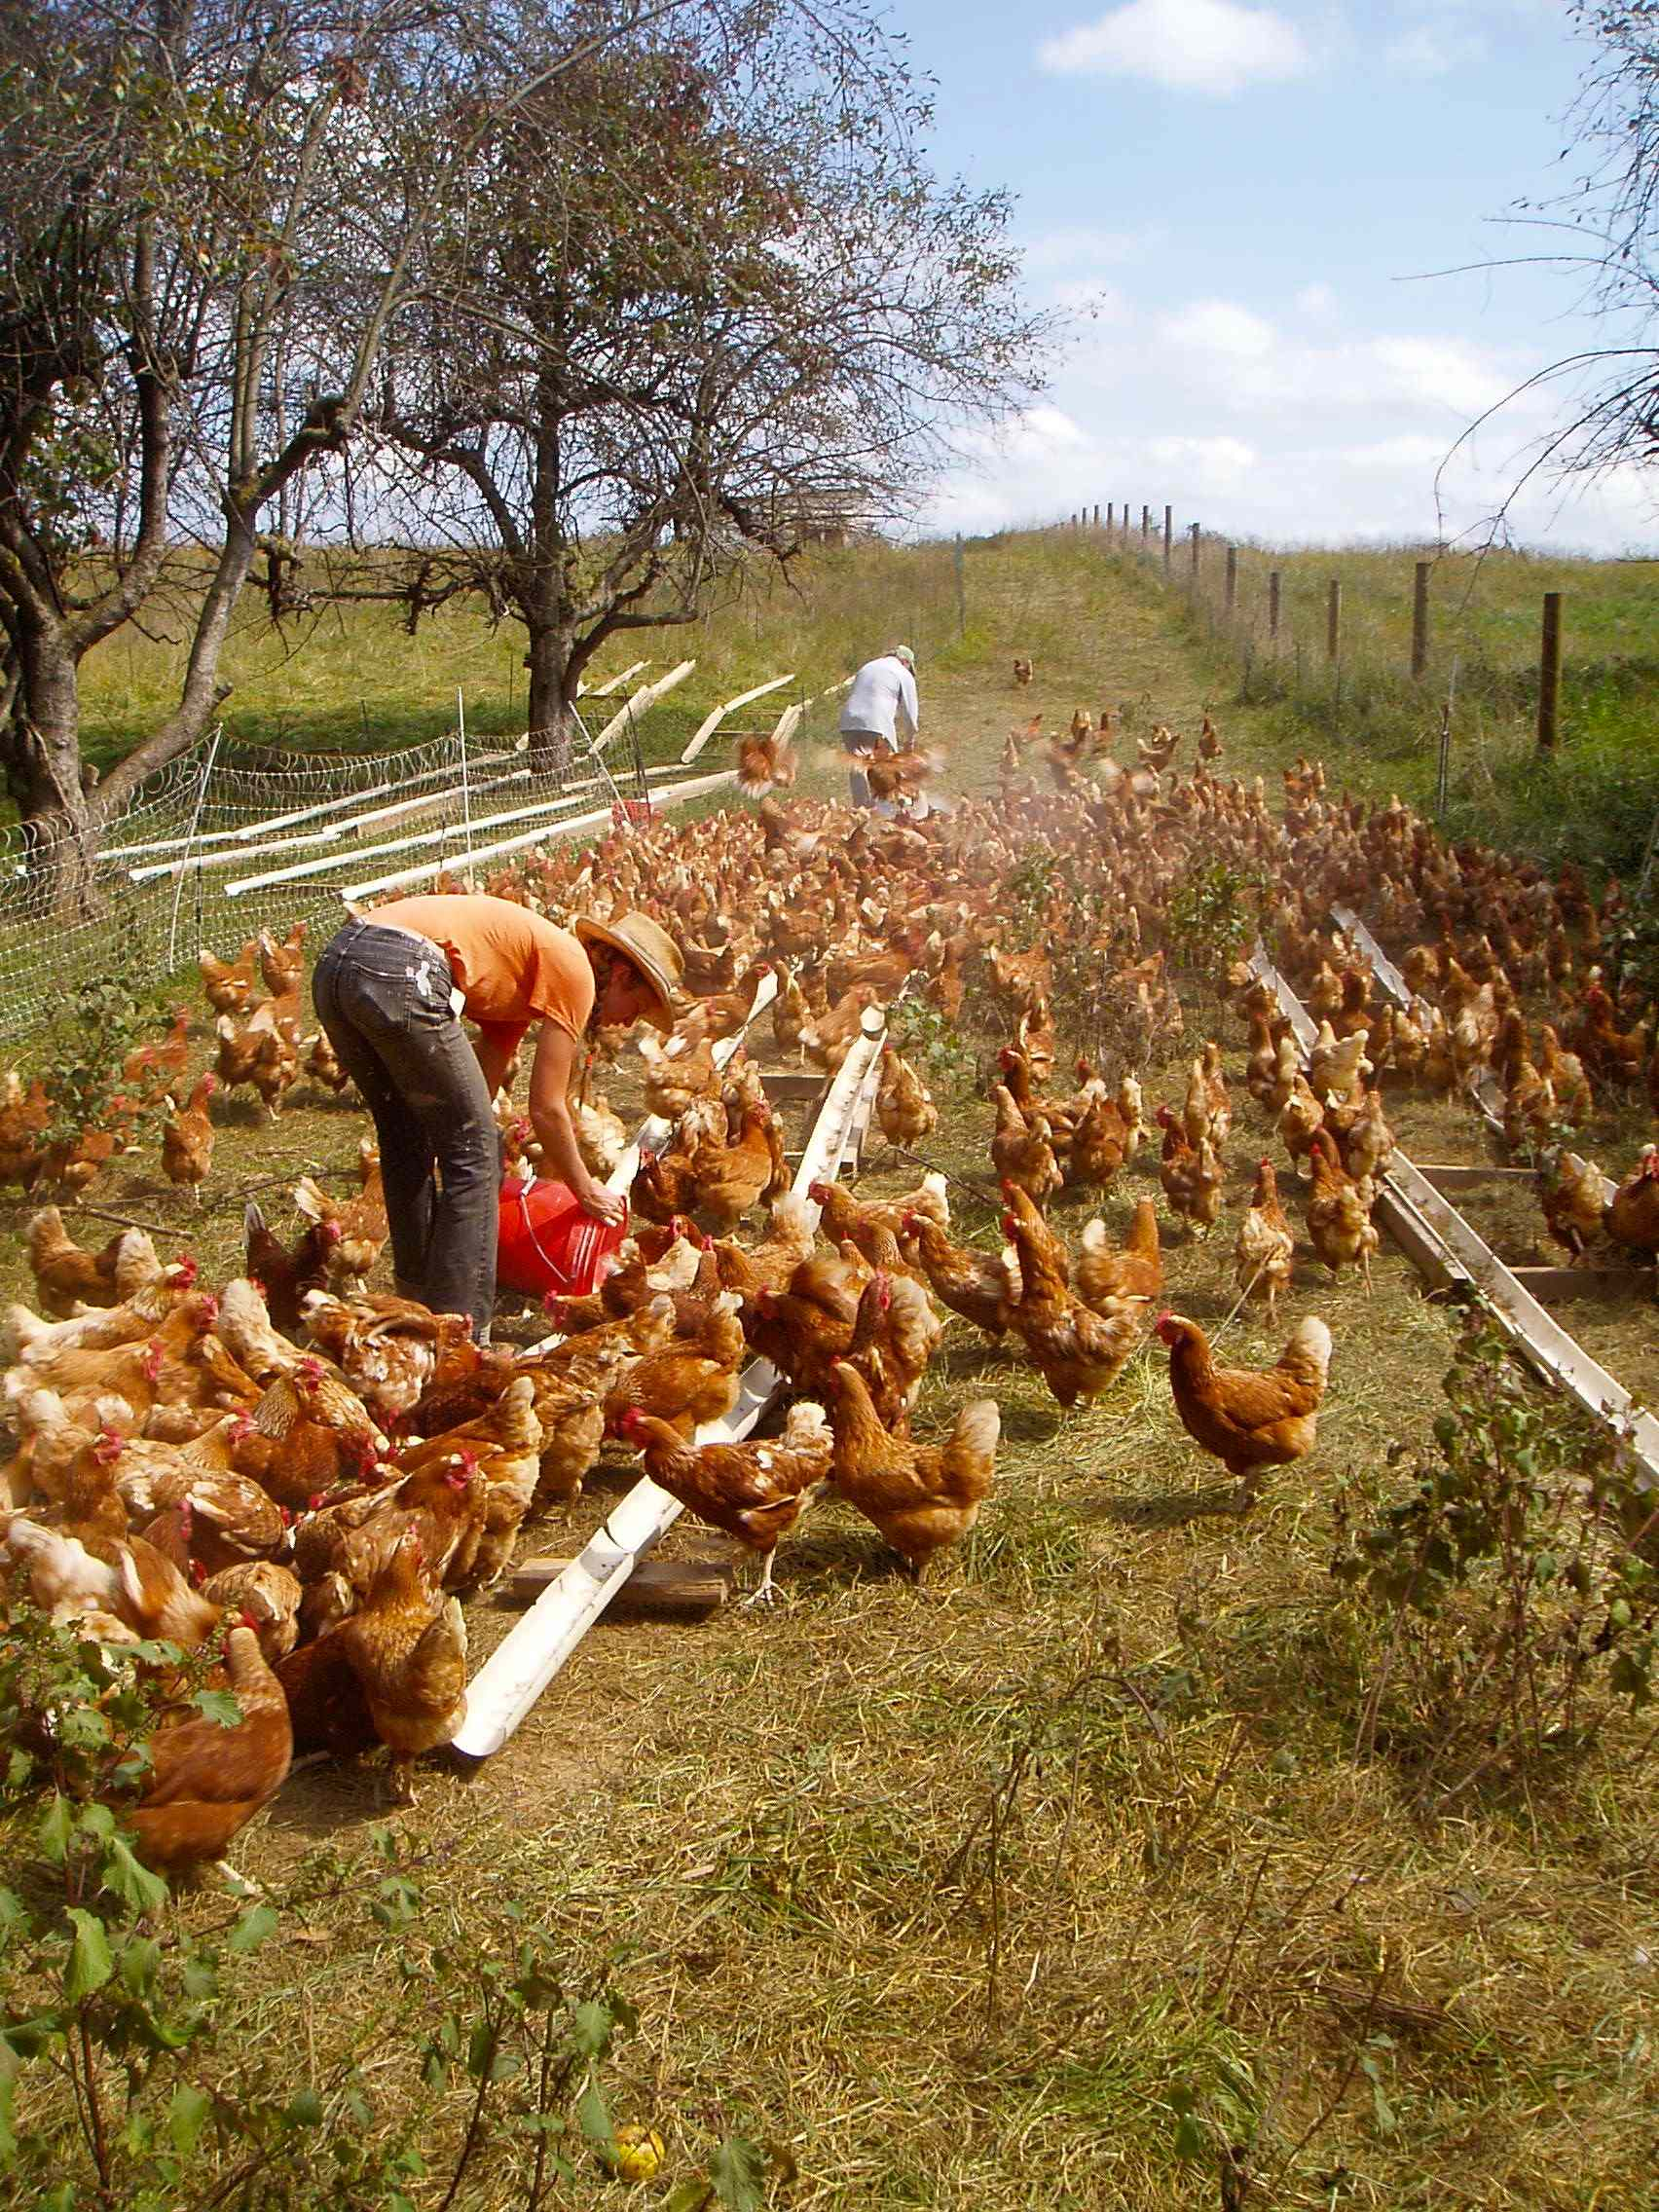 free range chicken farm near me